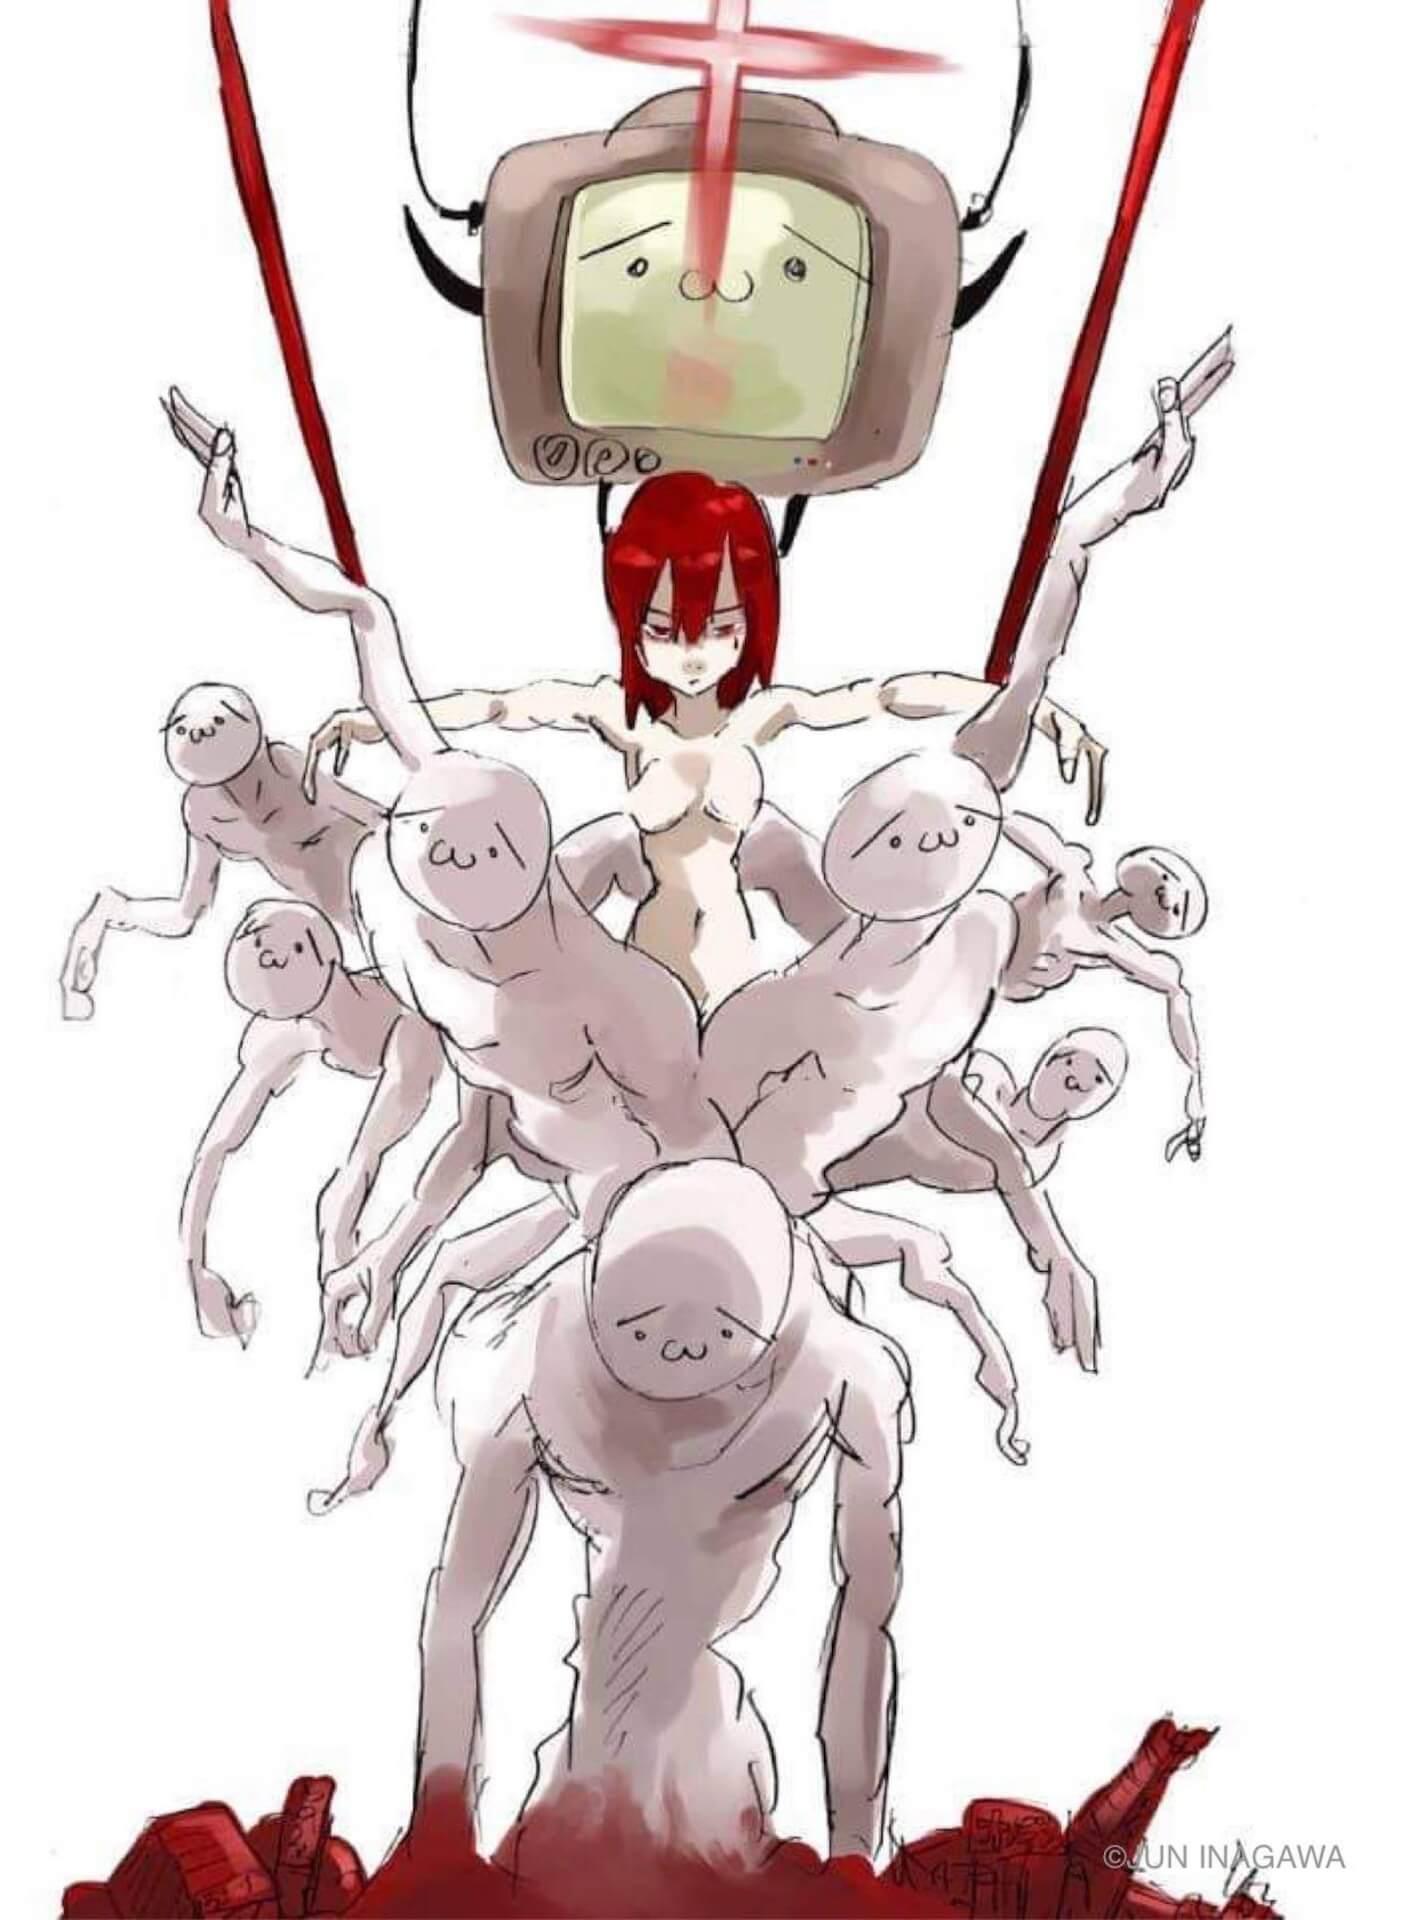 JUN INAGAWAの初作品集『情報破壊 マスメディアクラッシュ』がSHIBUYA TSUTAYAにて発売決定! art210423_juninagawa-210423_9